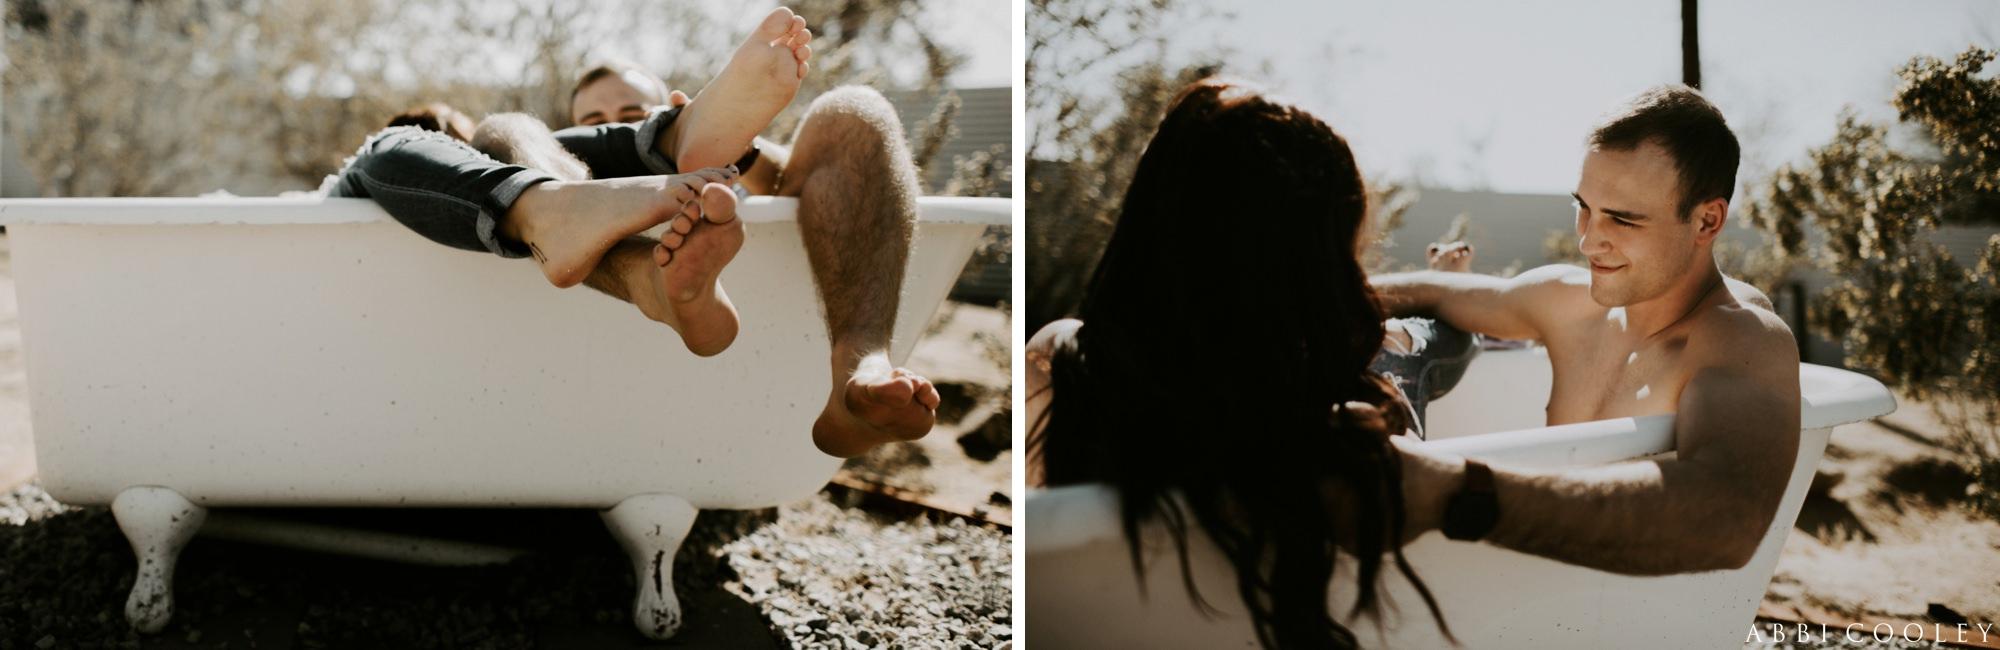 Joshua Tree bathtub photoshoot Joshua Tree California Engagement || Abbi Cooley